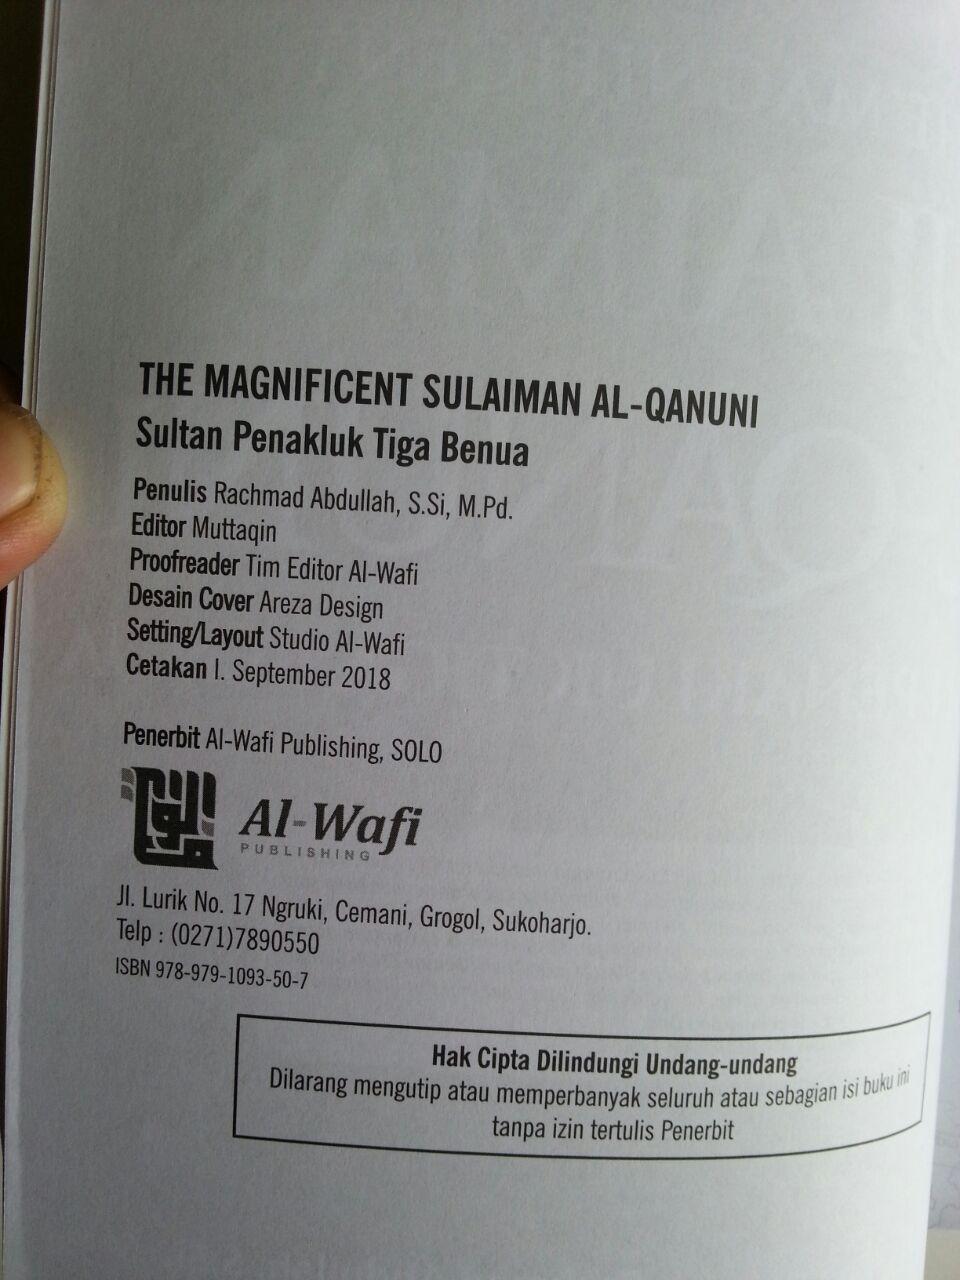 Buku The Magnificent Sulaiman Al-Qanuni Sultan Penakluk Tiga Benua isi 2